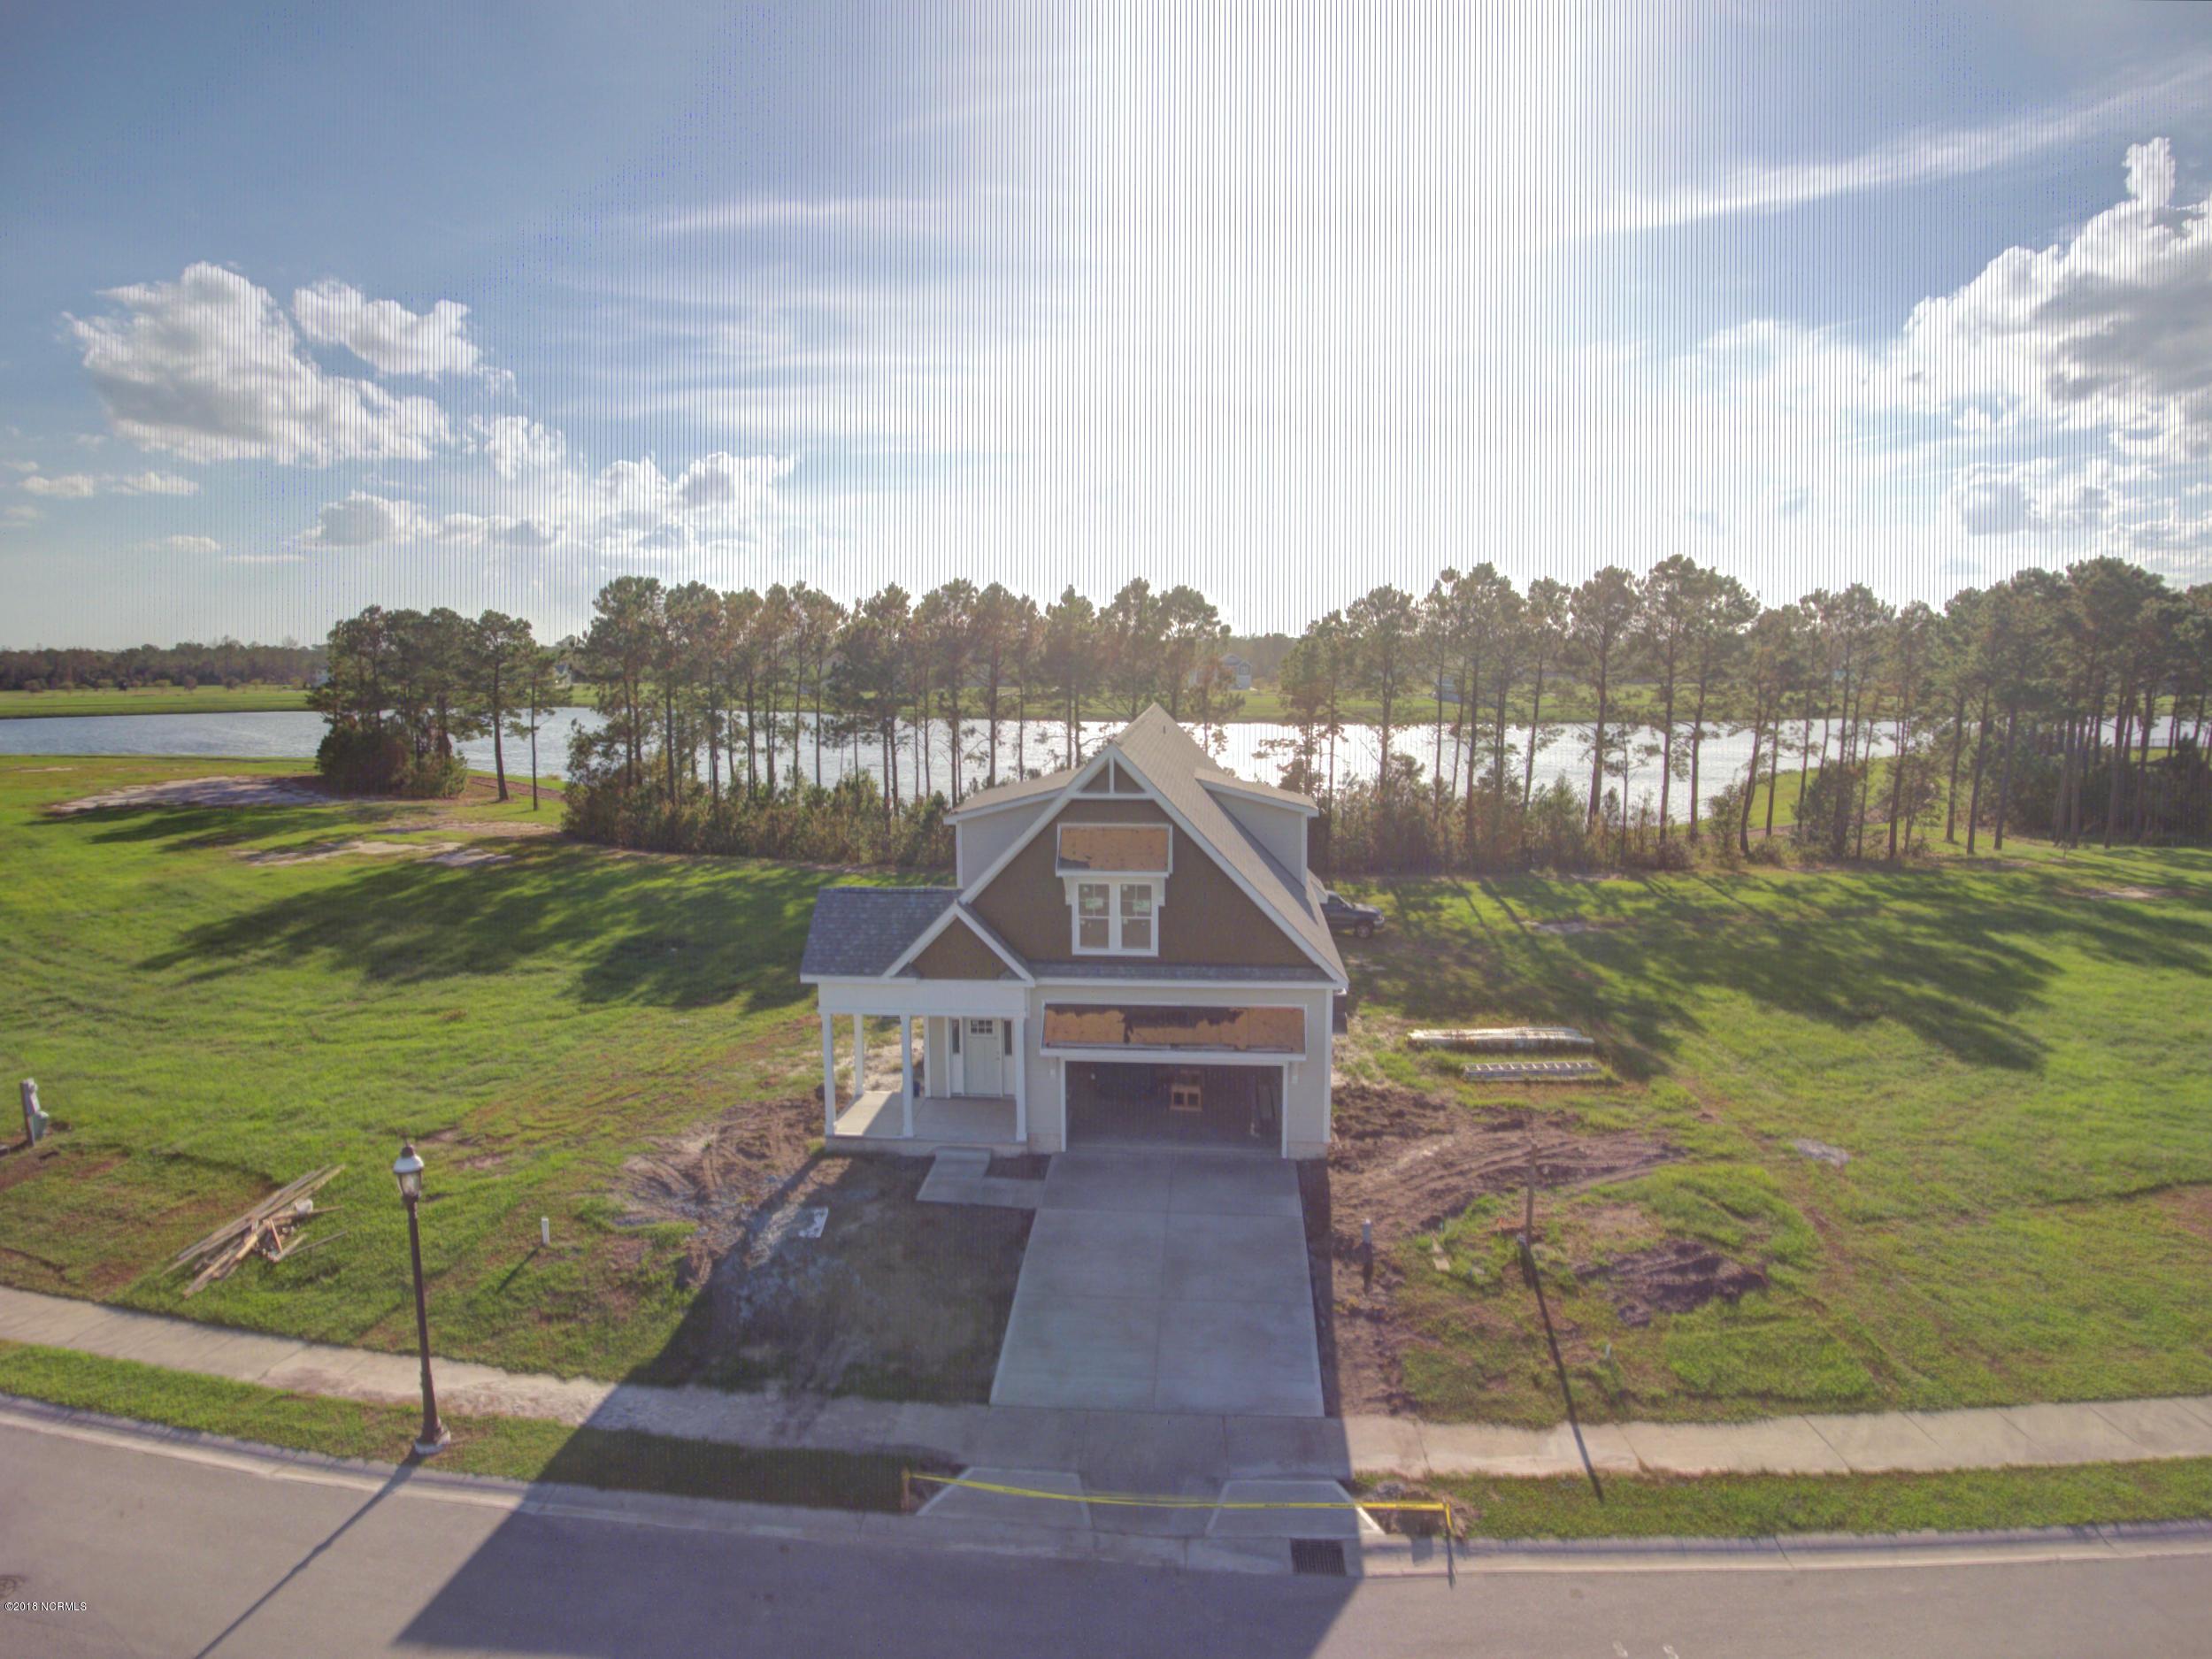 178 Spicer Lake Drive, Holly Ridge, North Carolina, 3 Bedrooms Bedrooms, 8 Rooms Rooms,3 BathroomsBathrooms,Single family residence,For sale,Spicer Lake,100135115